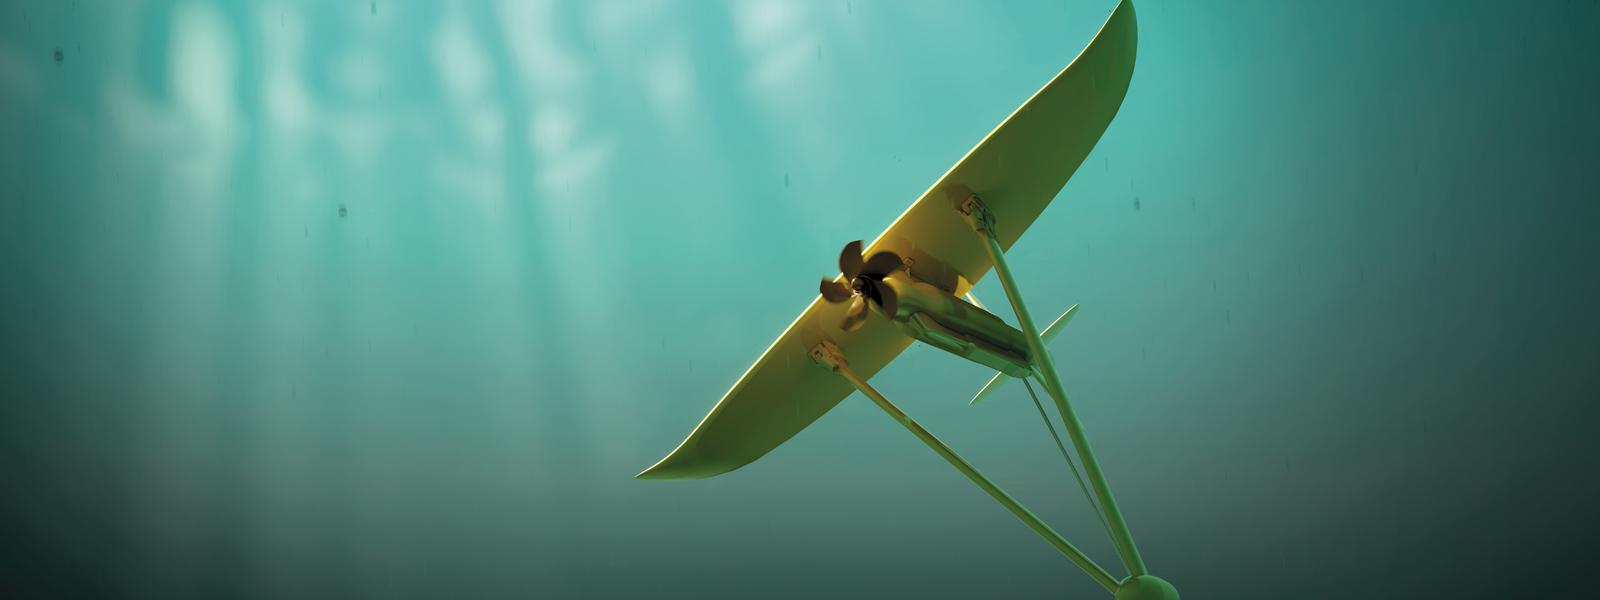 Hydrolienne cerf-volant de Minesto